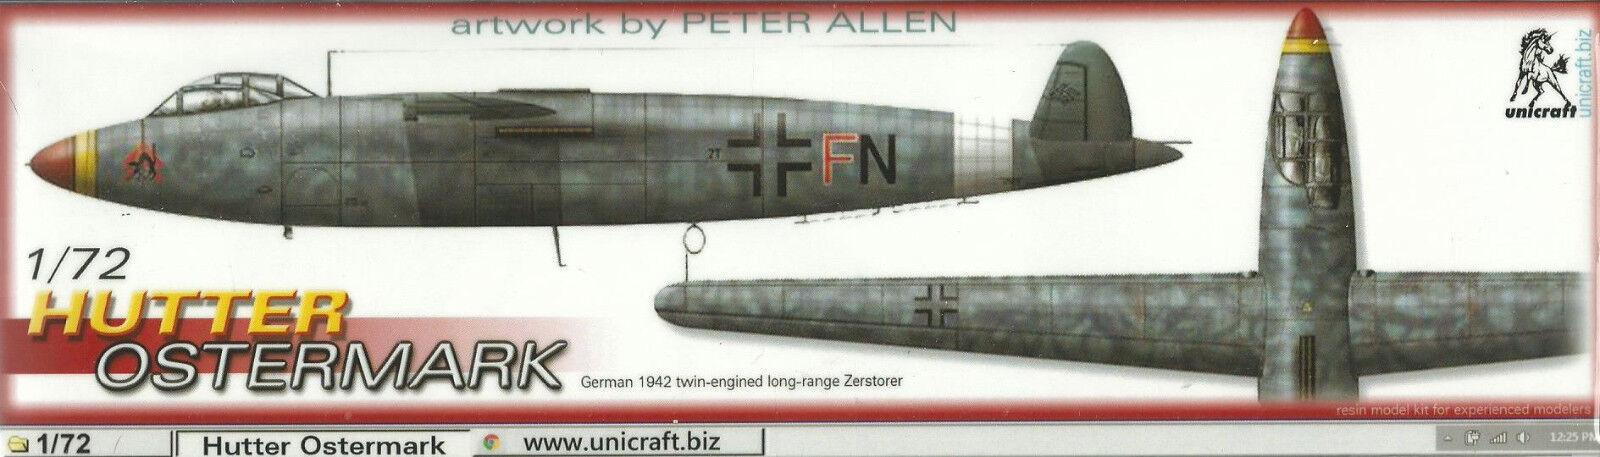 1 72 Unicraft Hutter Ostermark